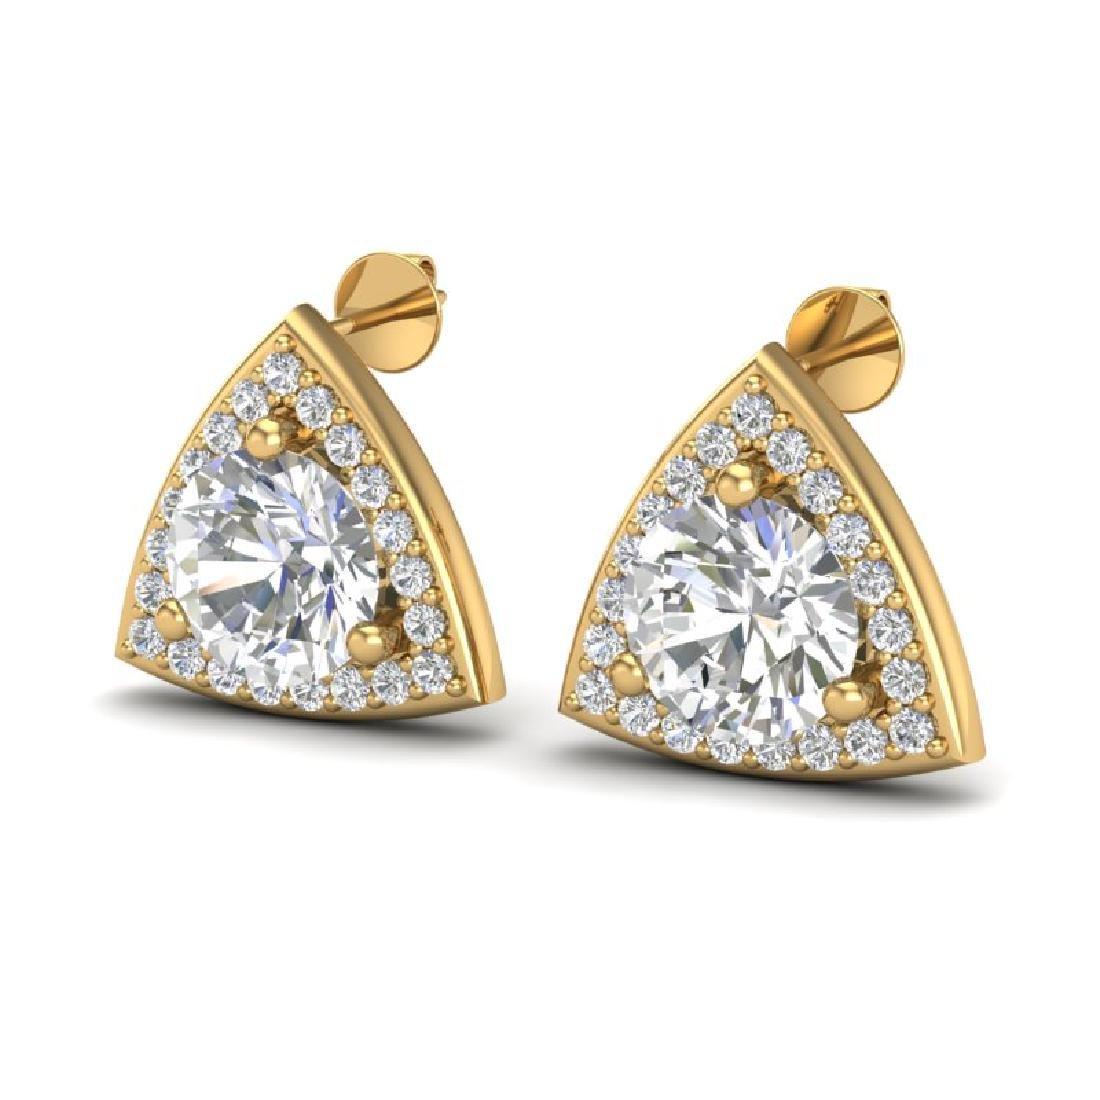 3 CTW VS/SI Diamond Stud Earrings 18K Yellow Gold